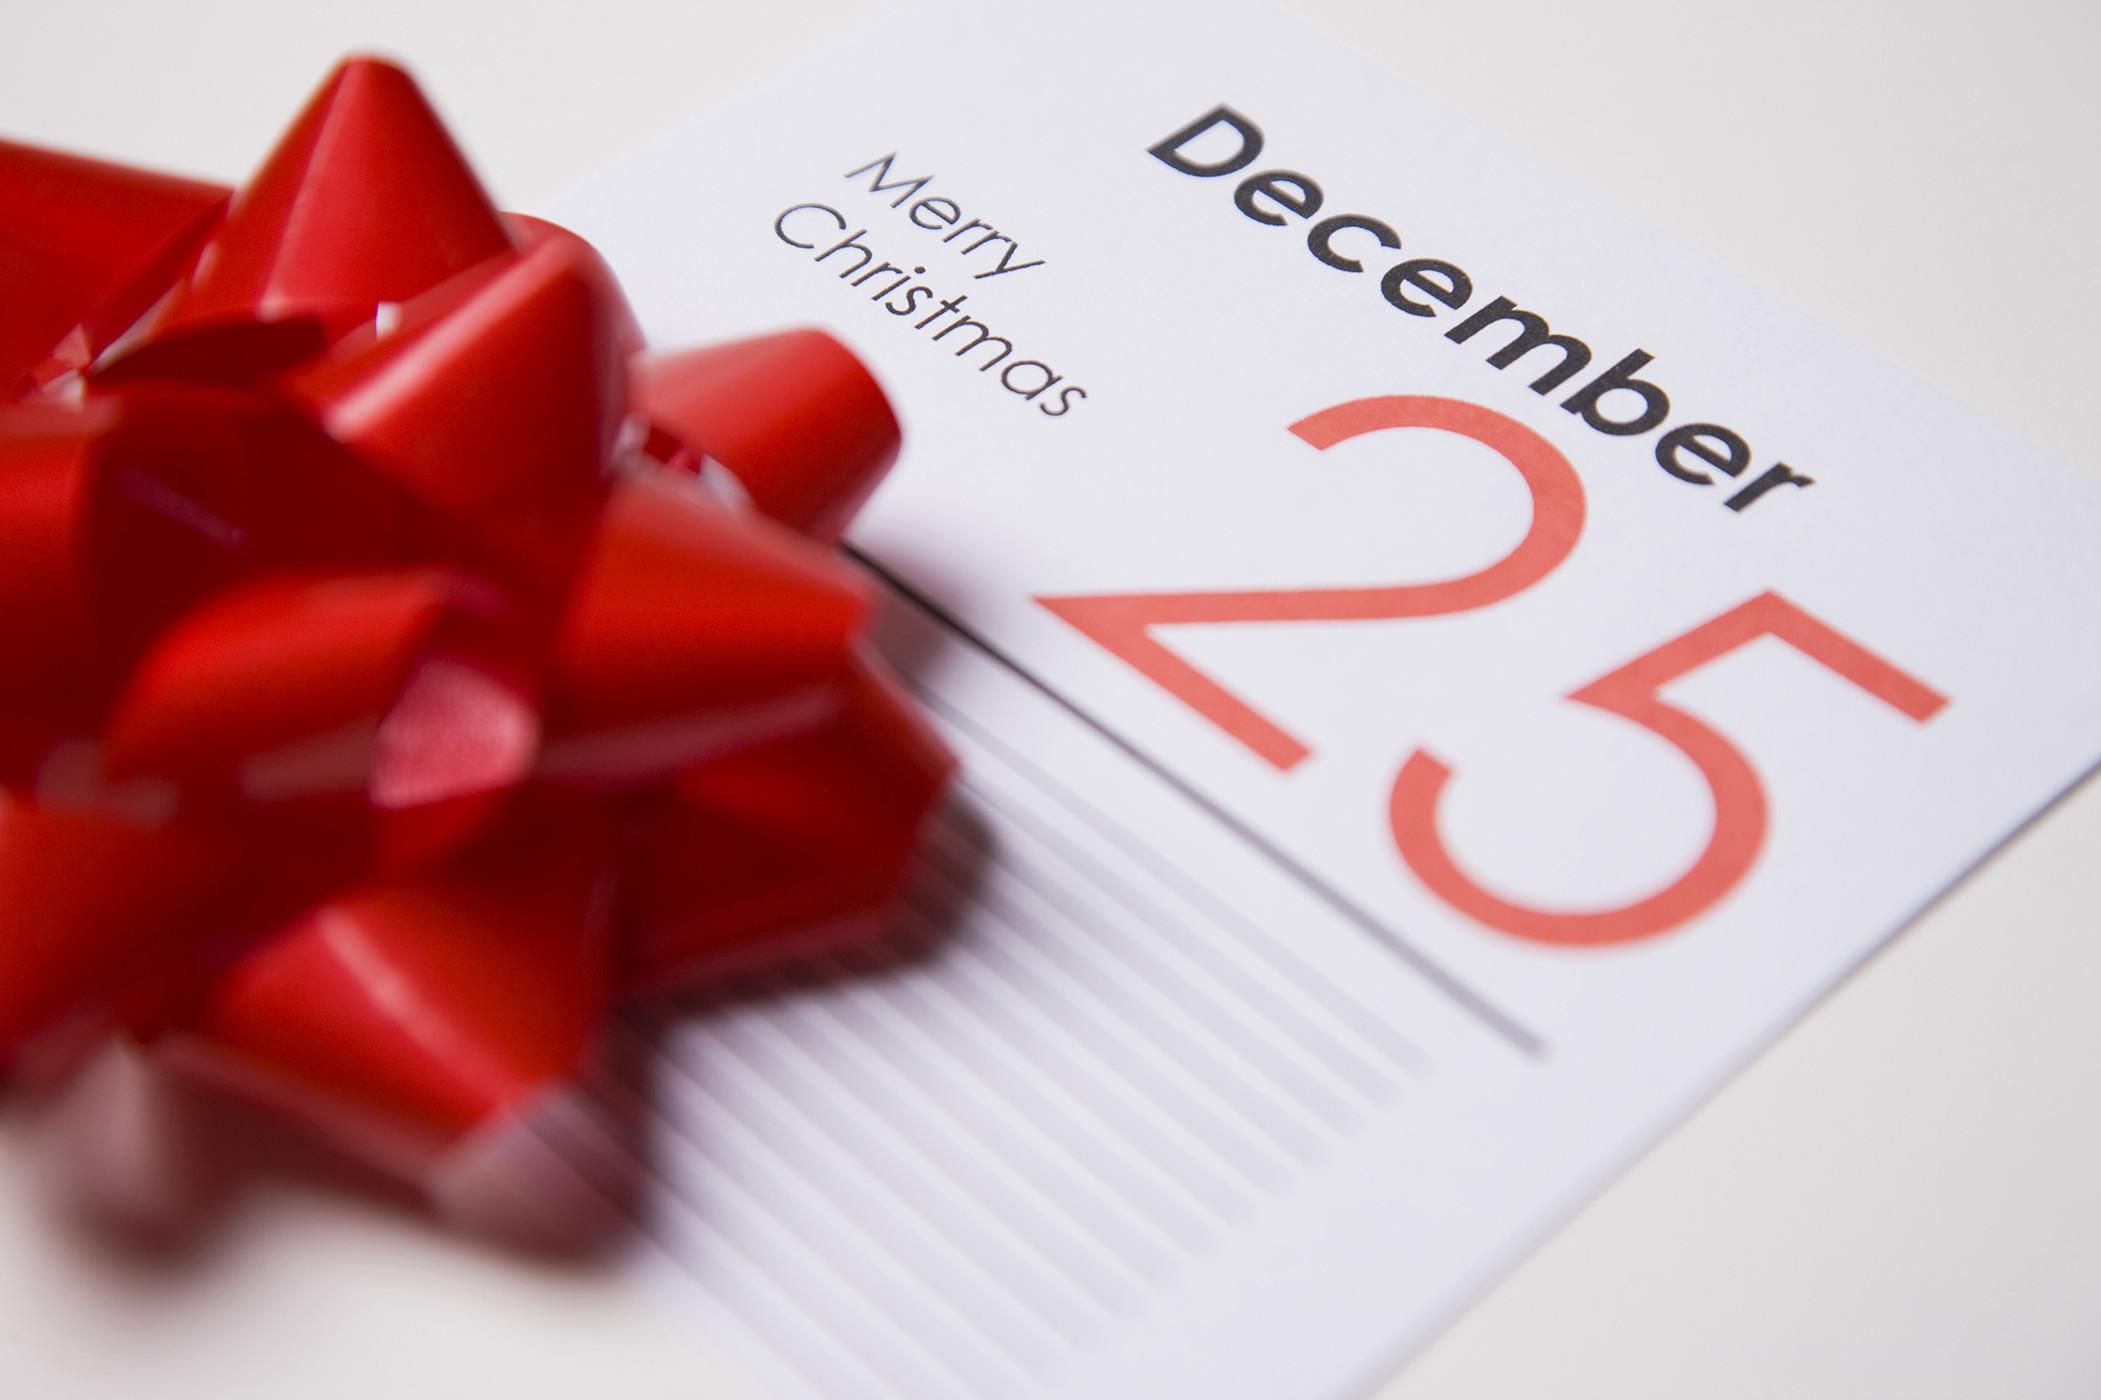 25th of December calendar card